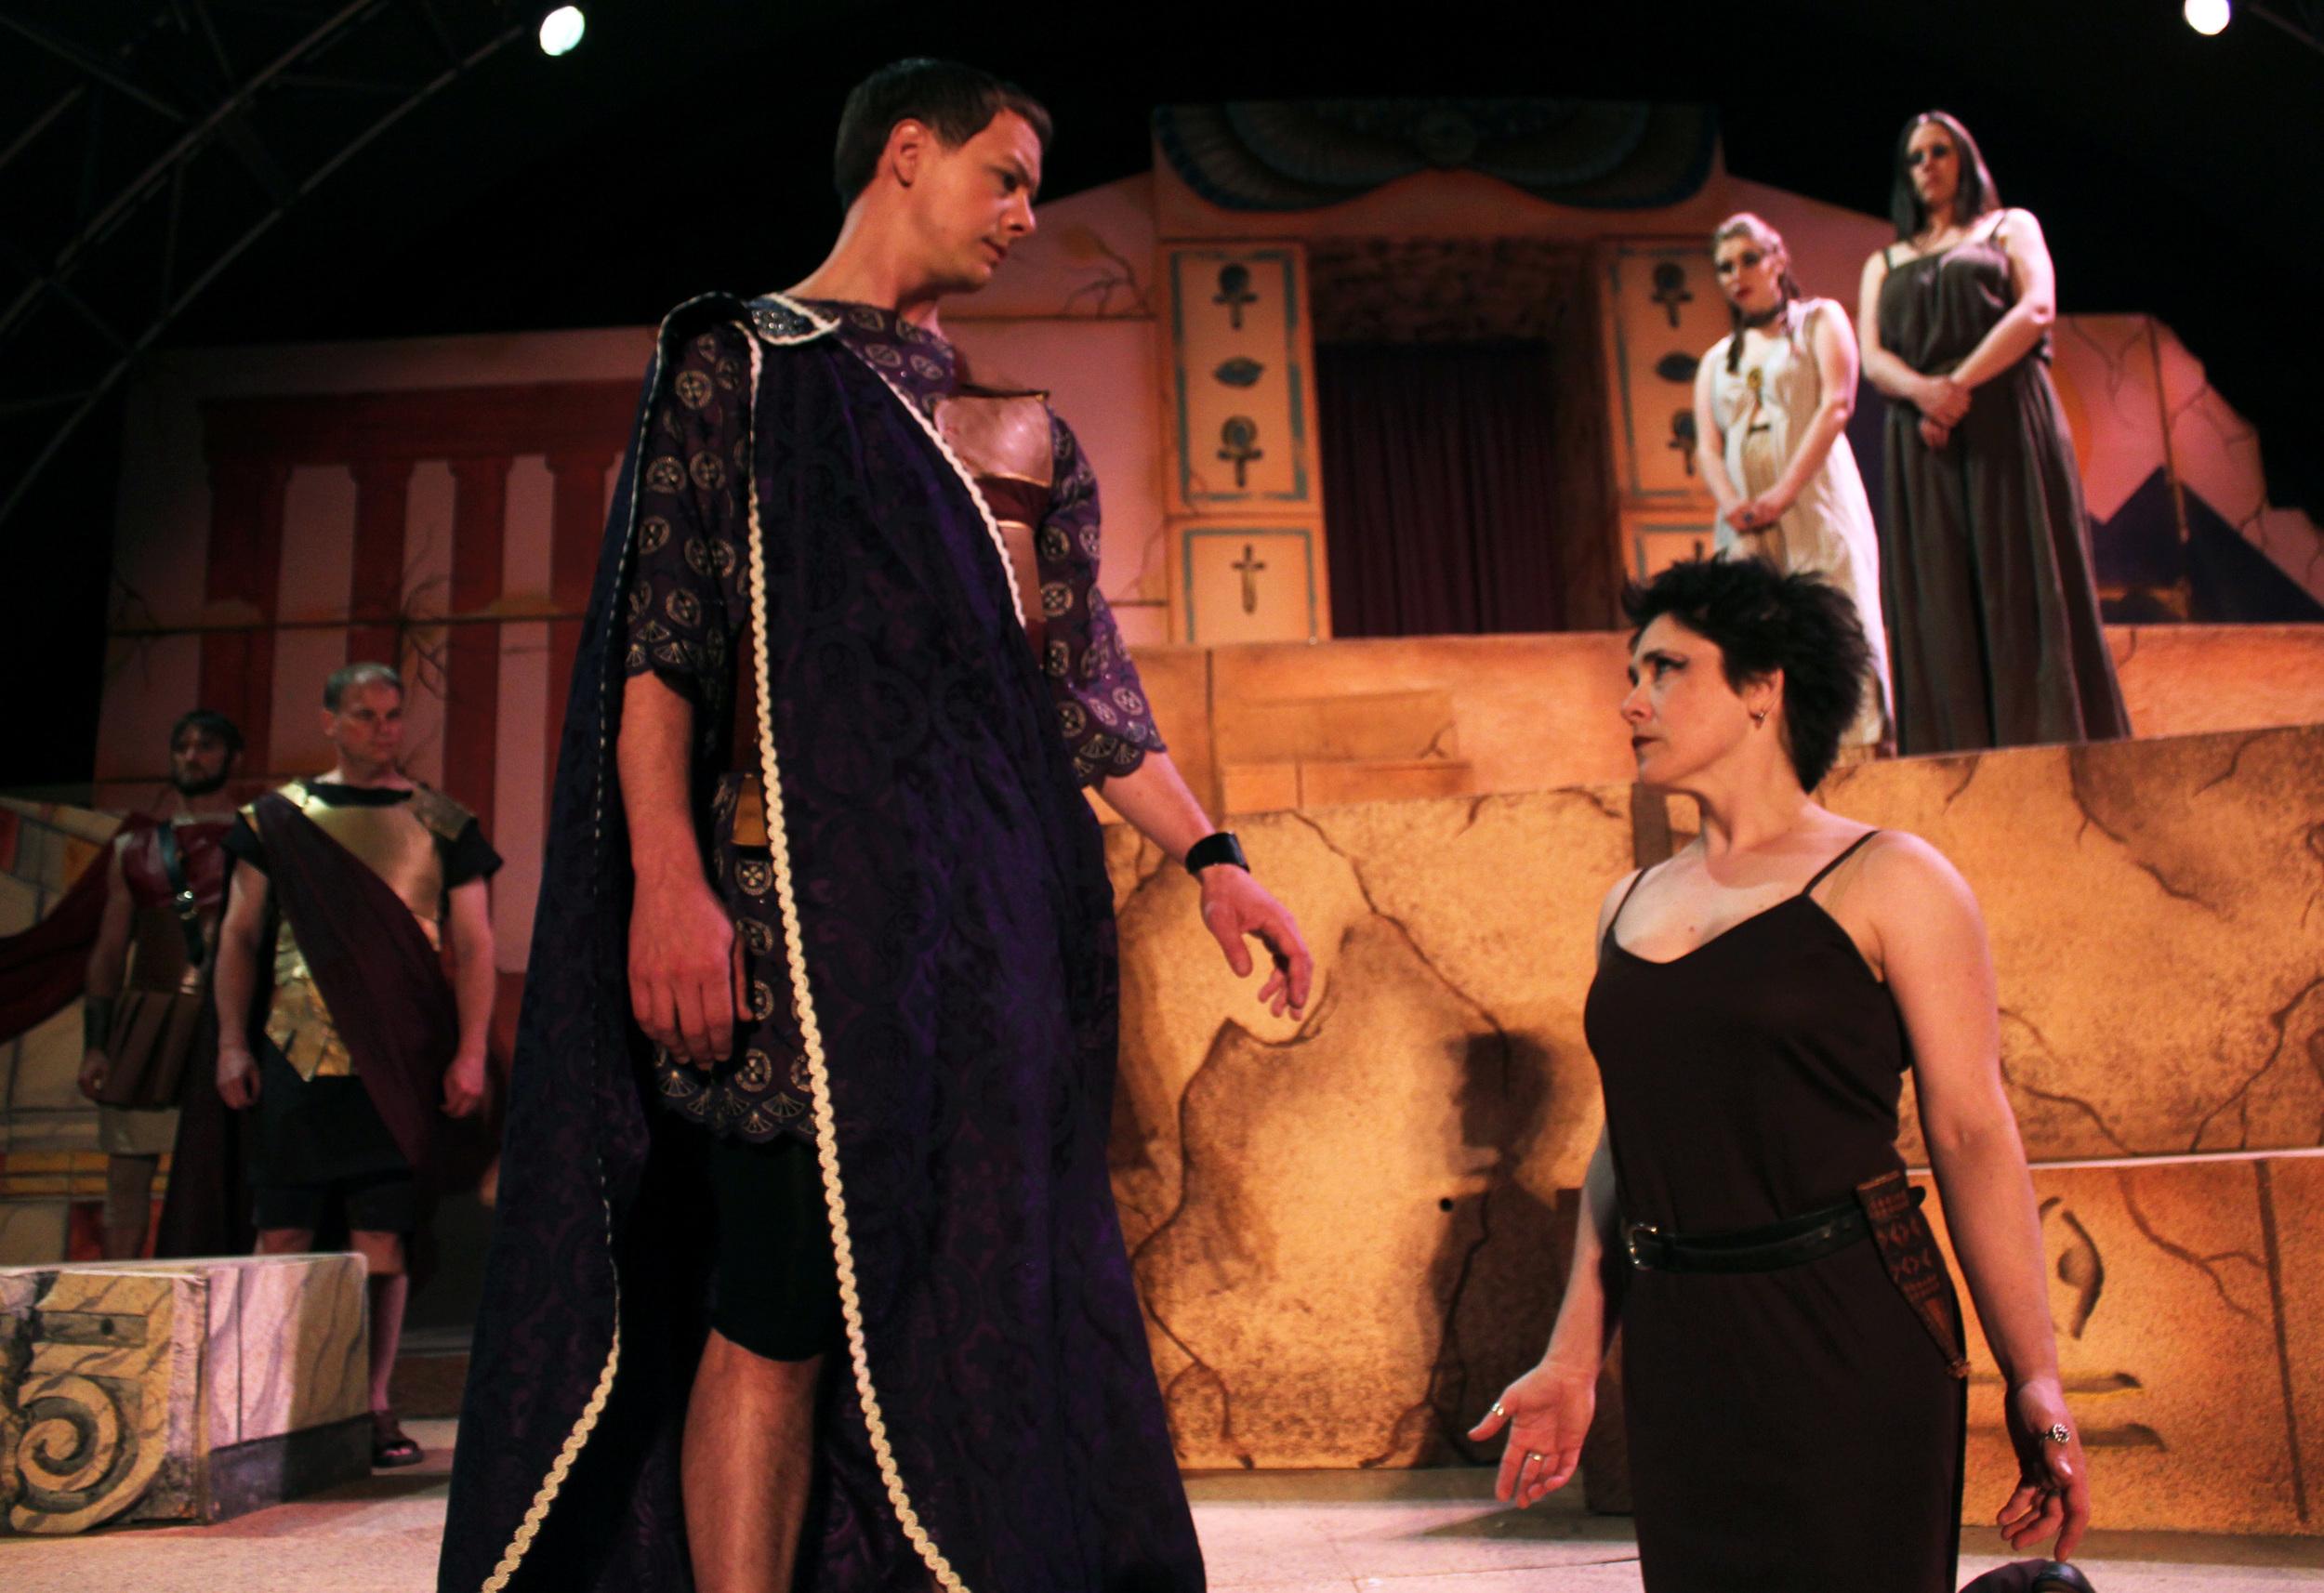 Agrippa (David Richwine), Octavius (Jeff Luttmoser), Cleopatra (Francesca Amendolia), Iras (Miranda Zerbe), Chairmian (Tara Herweg-Mann)